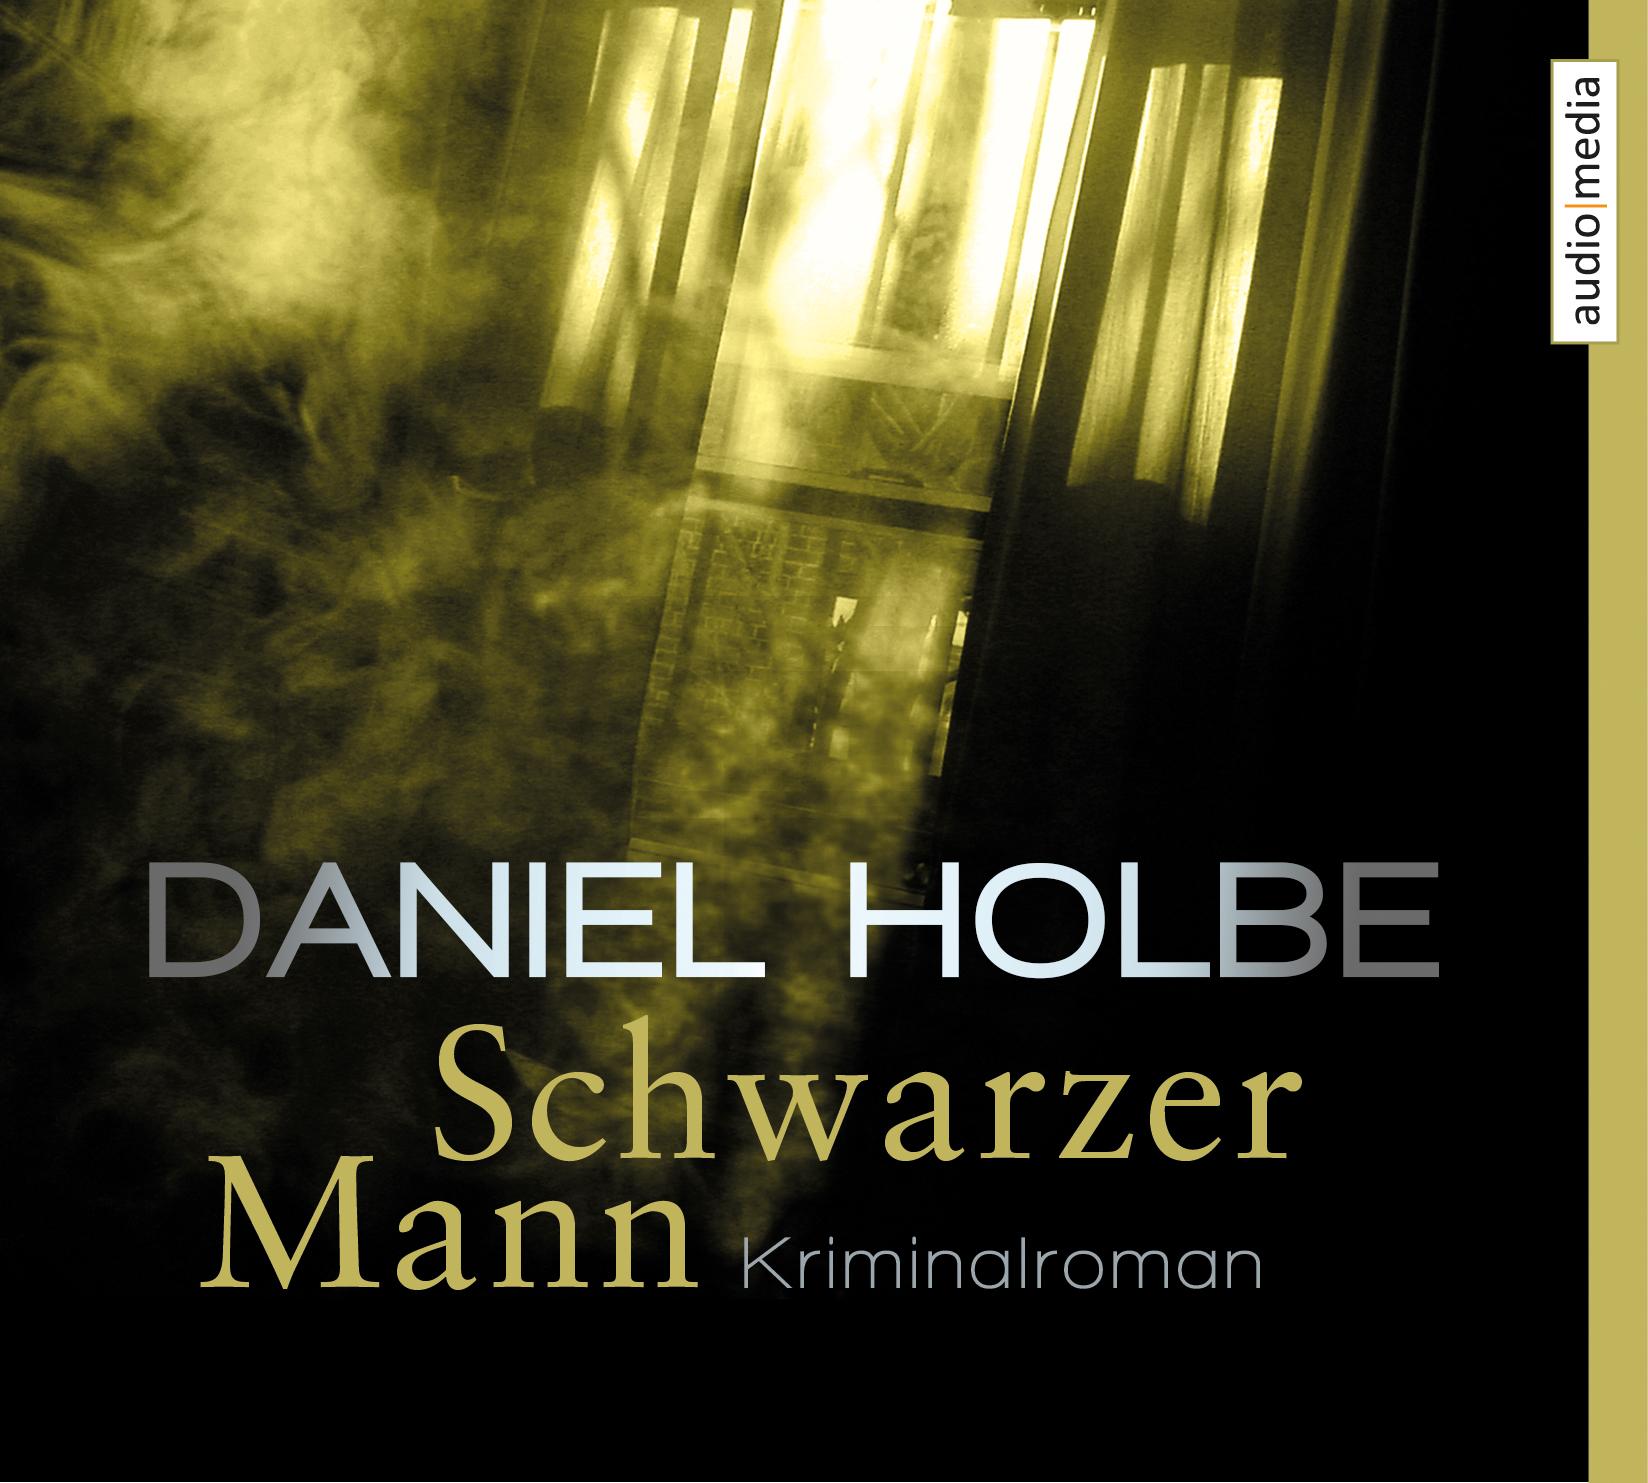 Schwarzer Mann - Daniel Holbe [6 Audio CDs]